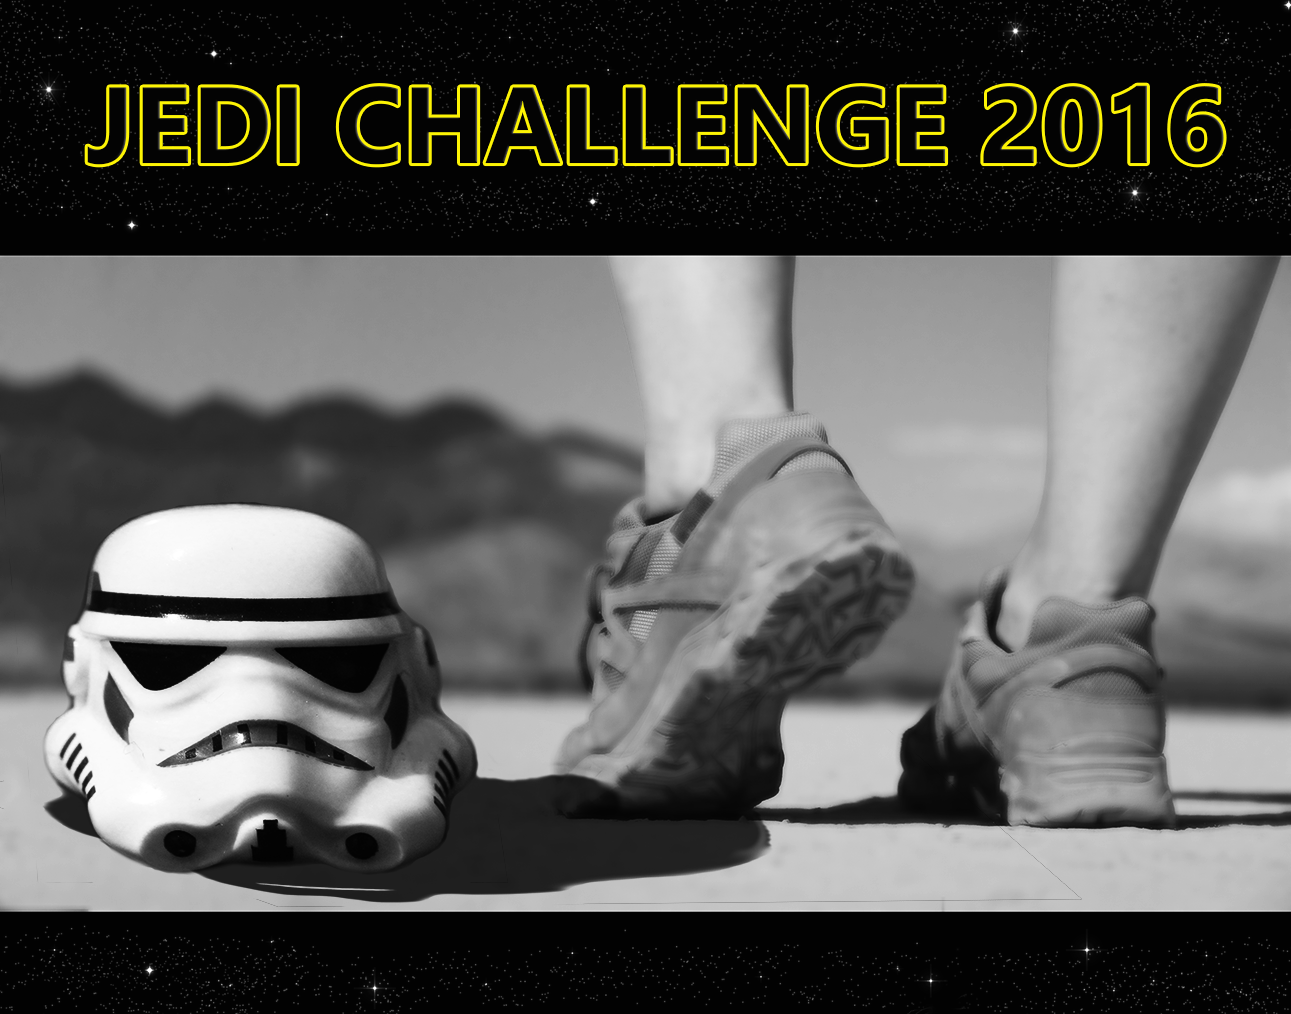 jedi challenge title